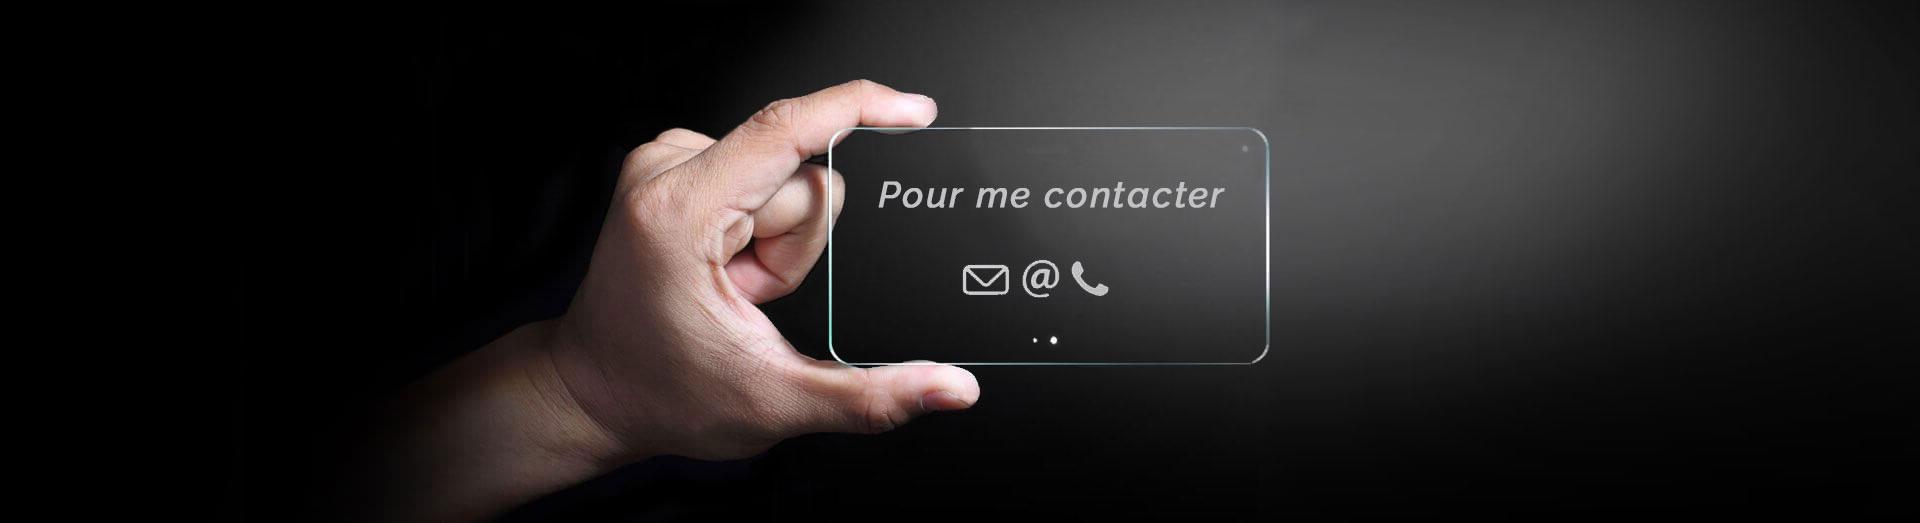 https://cf-graphiste.fr/wp-content/uploads/2018/01/Fond-Contact.jpg